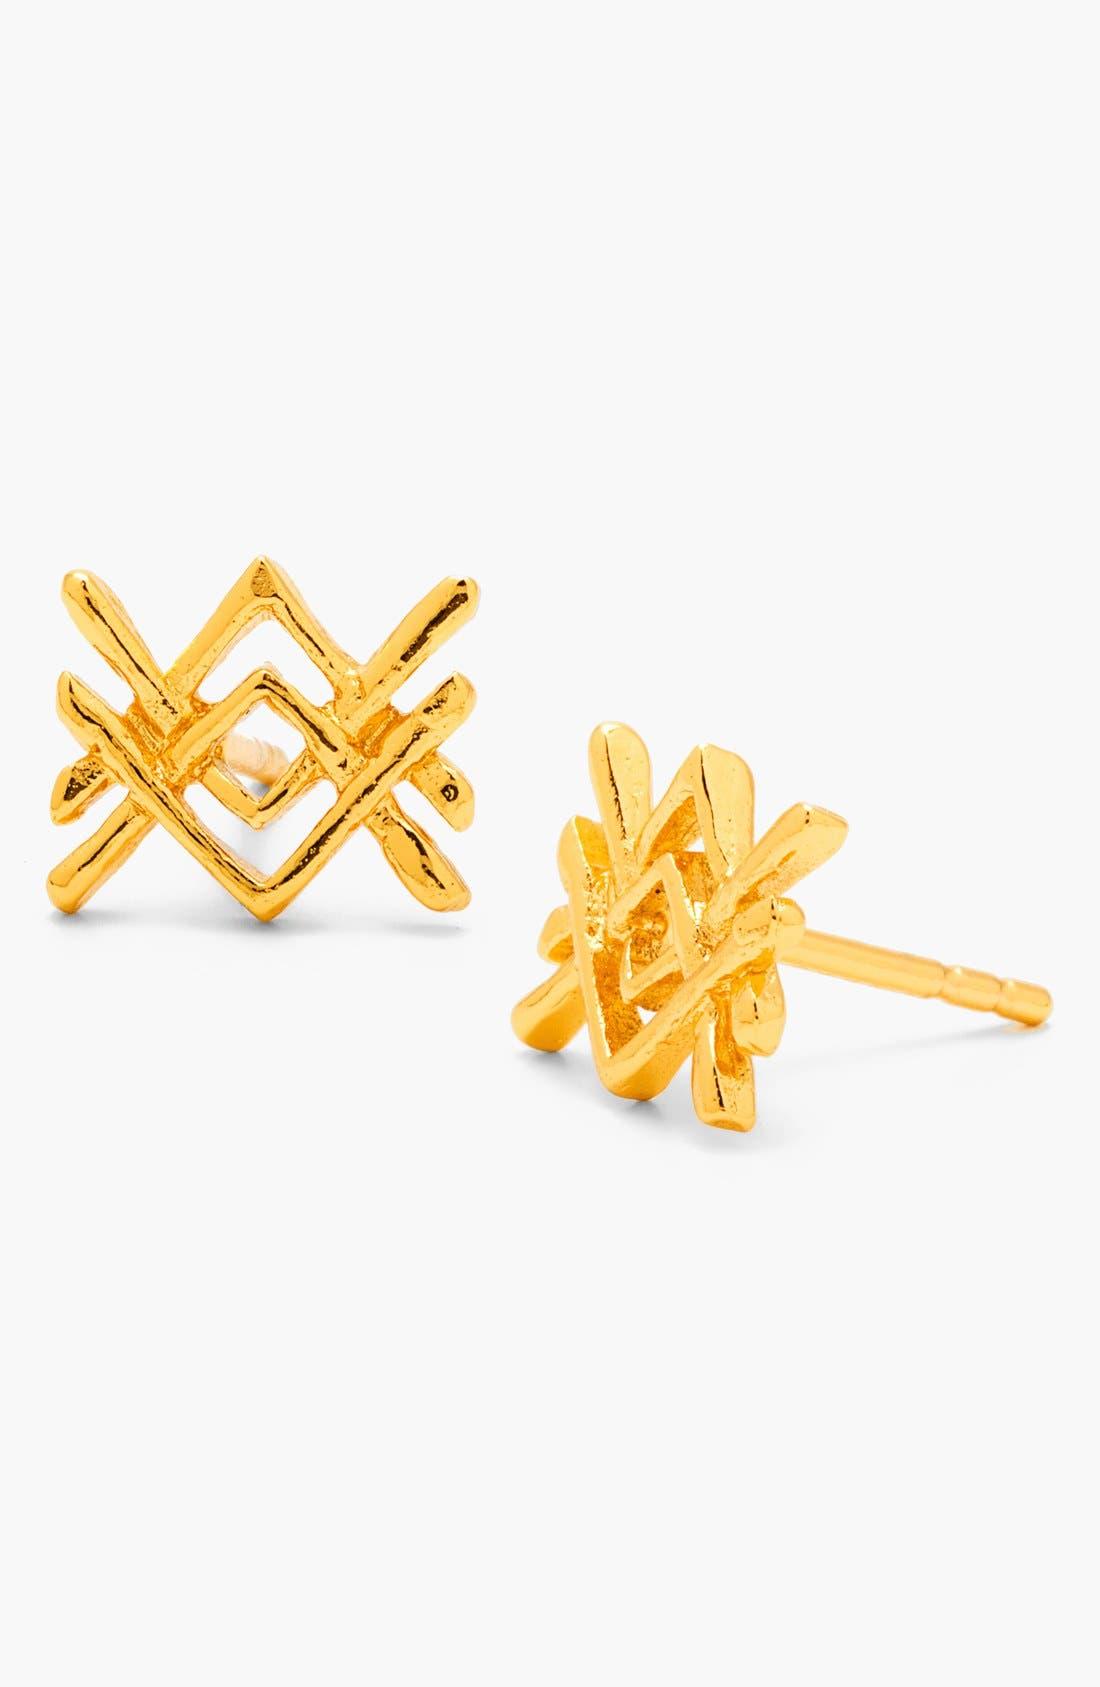 Alternate Image 1 Selected - gorjana 'Mesa' Stud Earrings